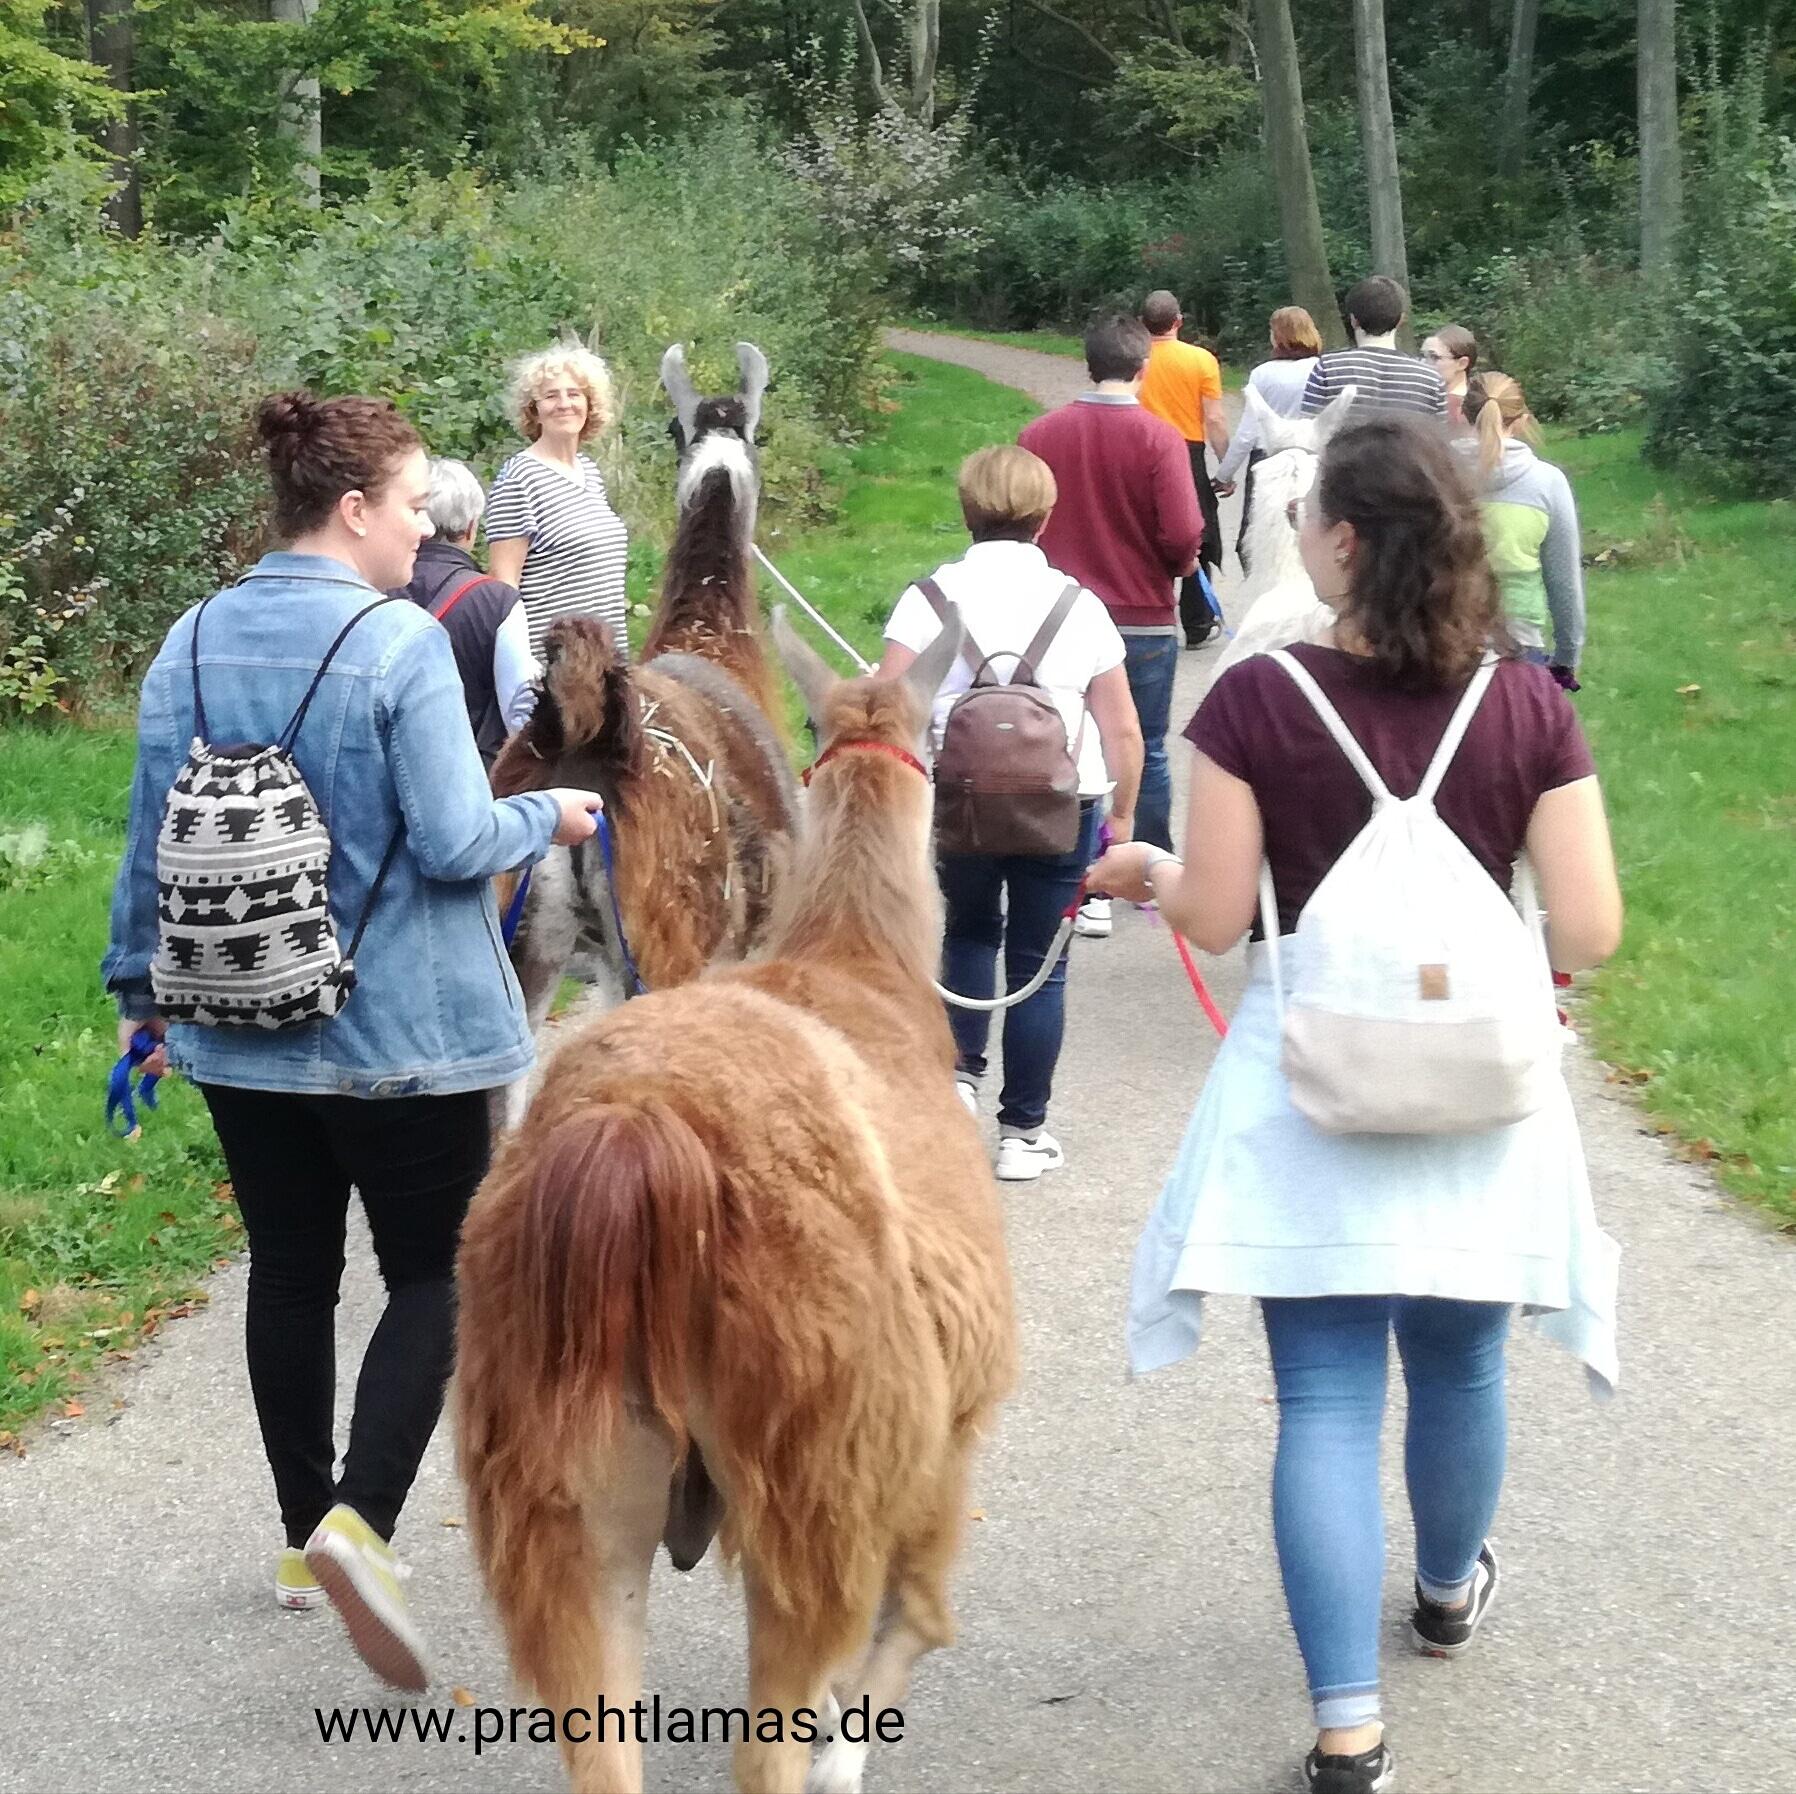 Lamawanderungen im Gesundheitspark Nienhausen Gelsenkirchen bei den Prachtlamas, Beate Pracht